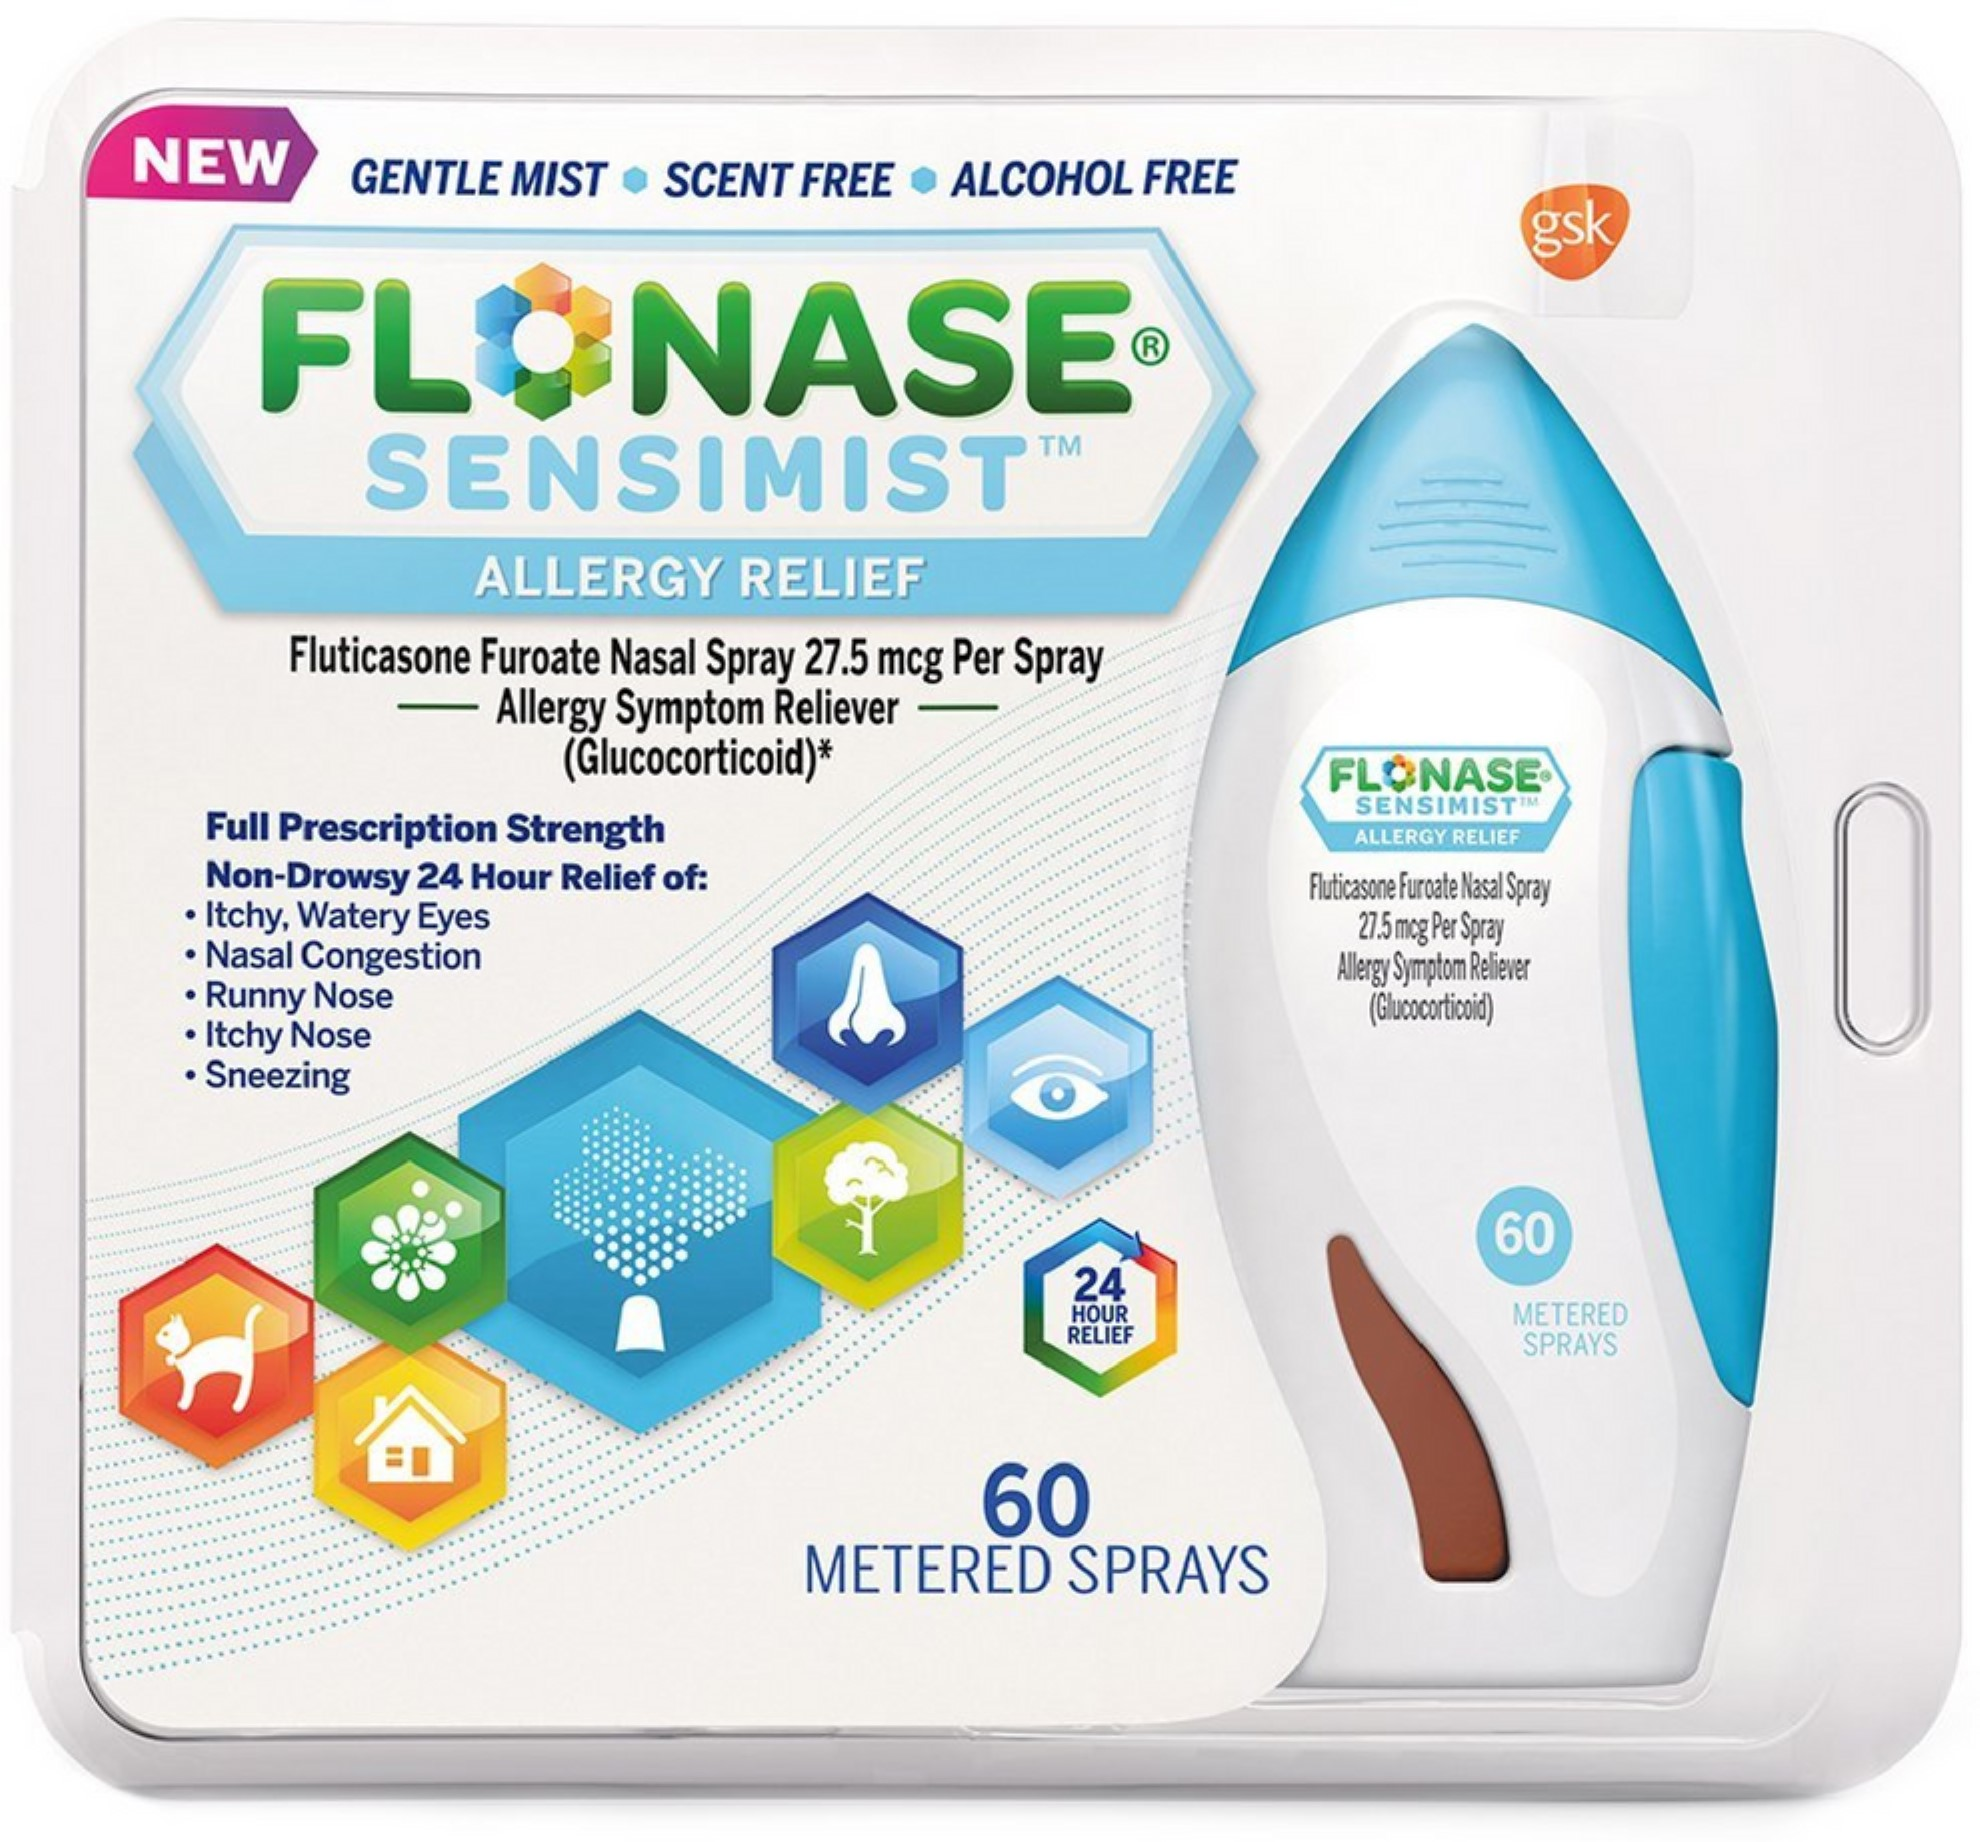 2 Pack - Flonase Sensimist Allergy Relief Spray, 60 Metered Sprays 1 ea